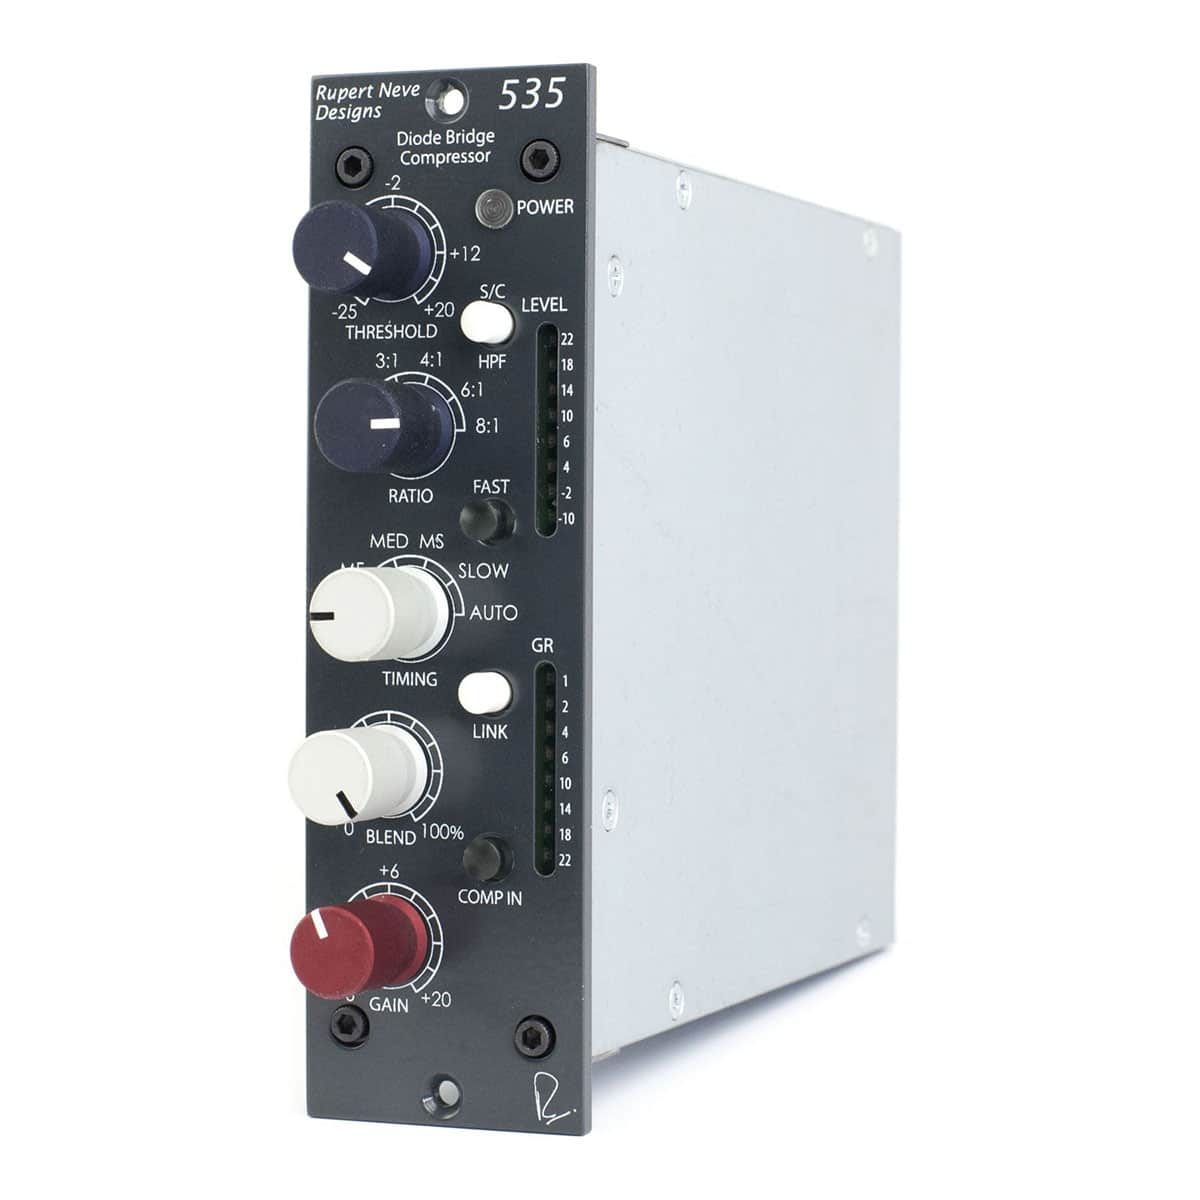 Rupert Neve 535 03 Pro Audio, Outboard, Compressori